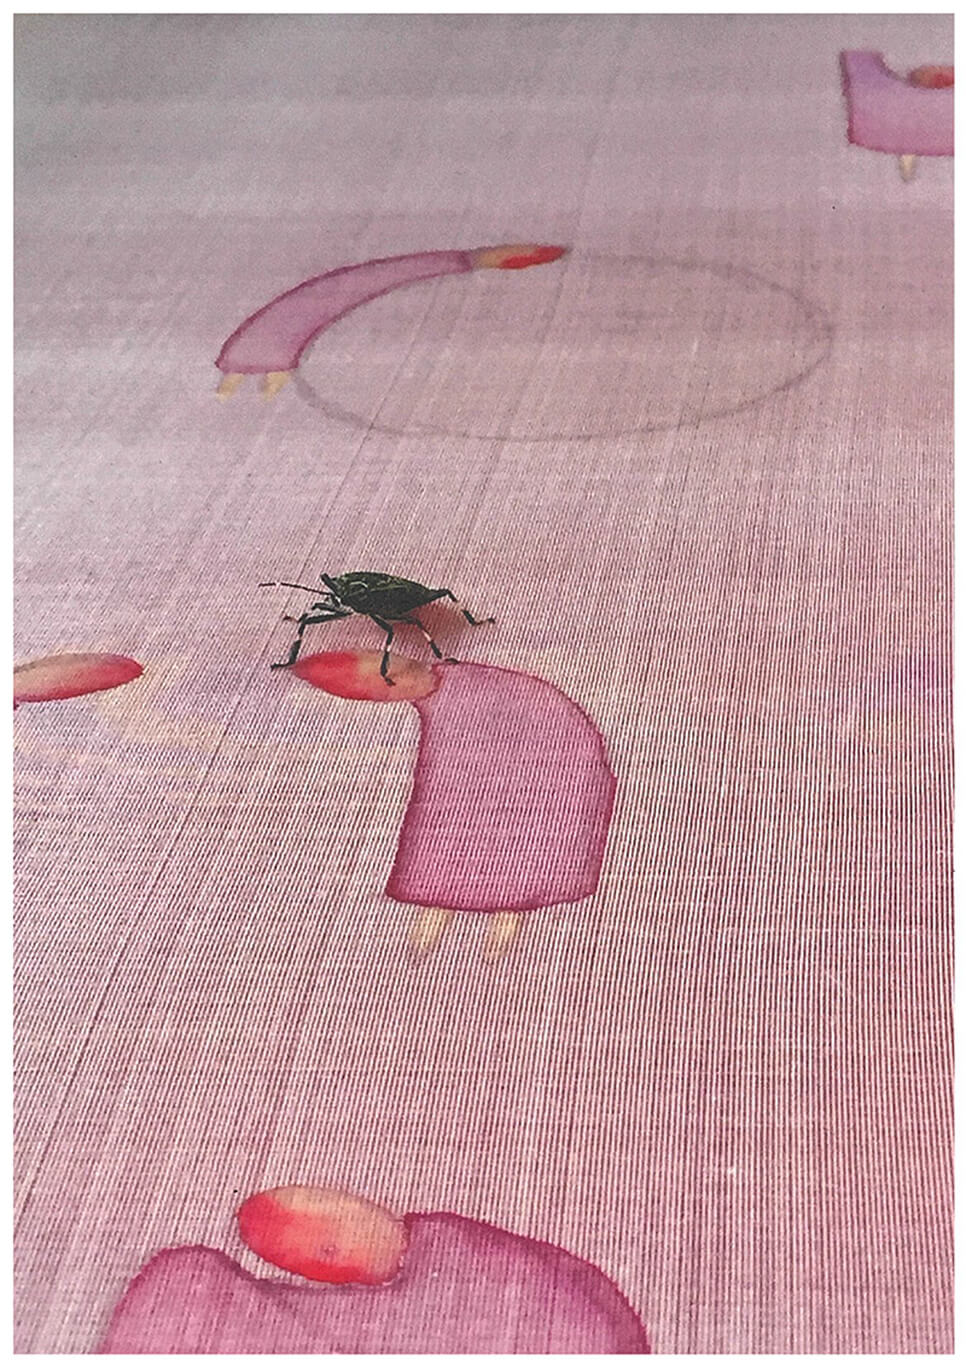 tetra-202003-Camilla Thanh Men Lundquist 個展2